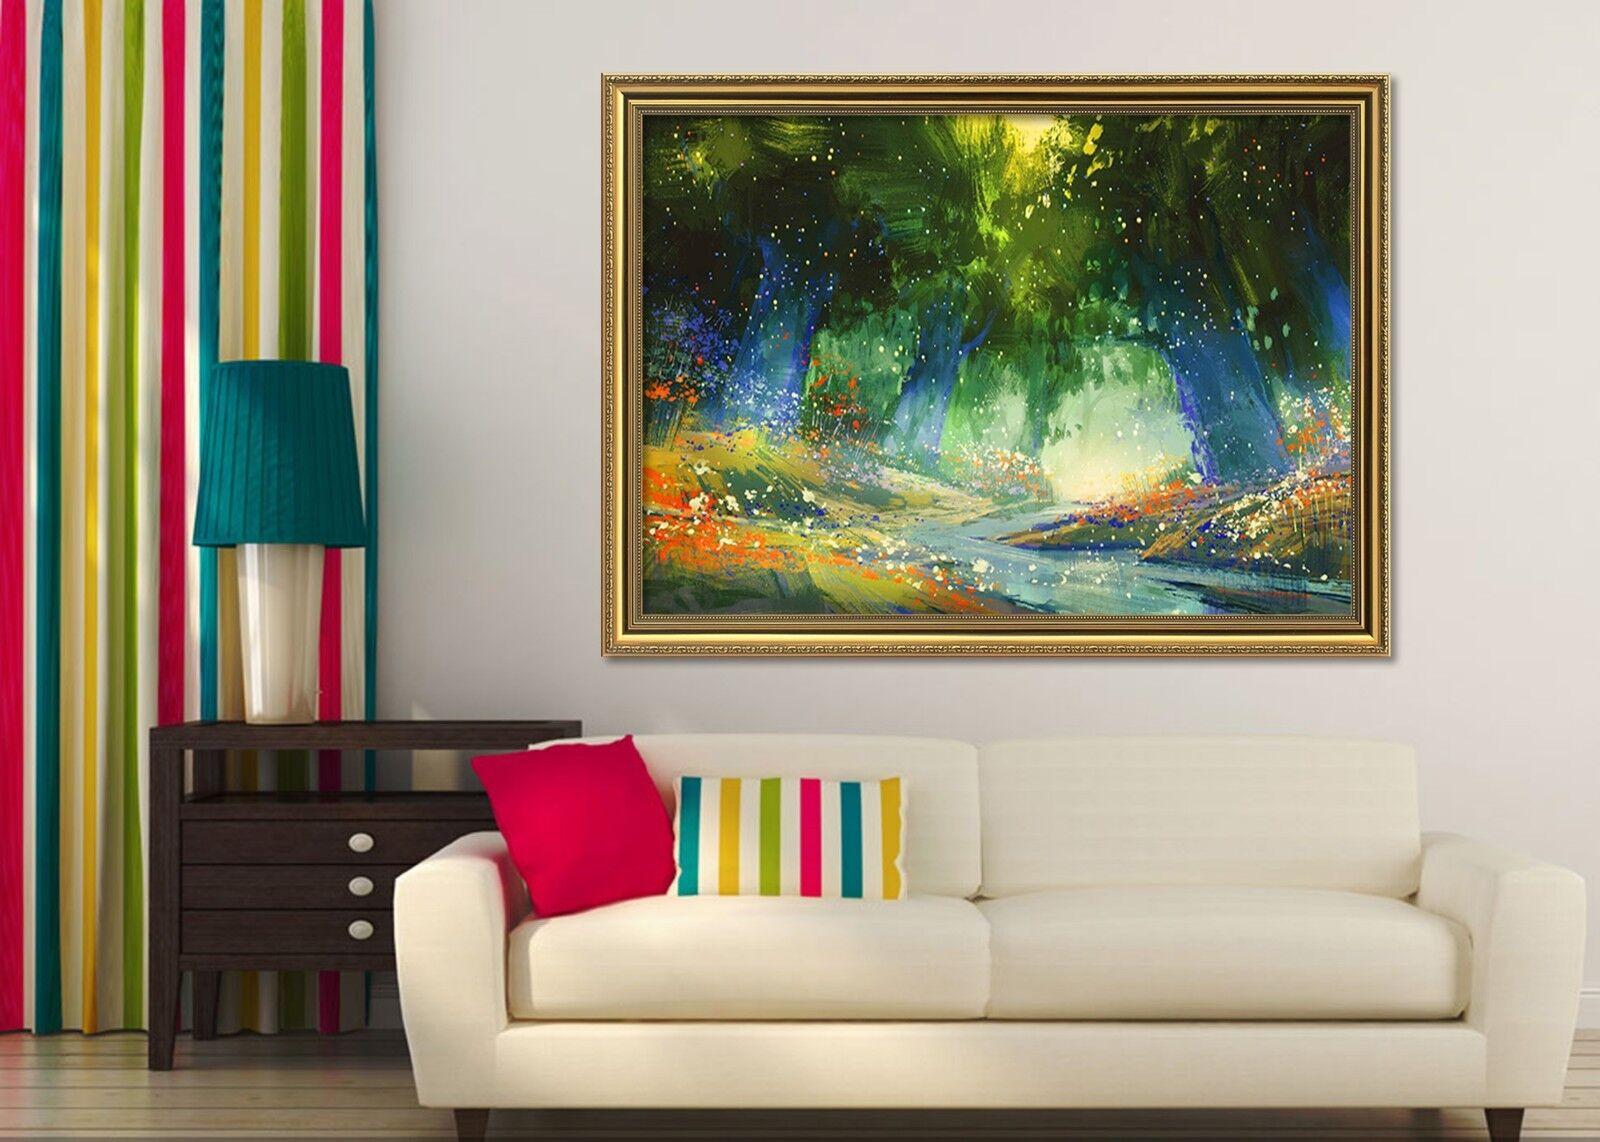 3D Forest Oil Painting 1 Framed Poster Home Decor Print Painting Art WALLPAPER